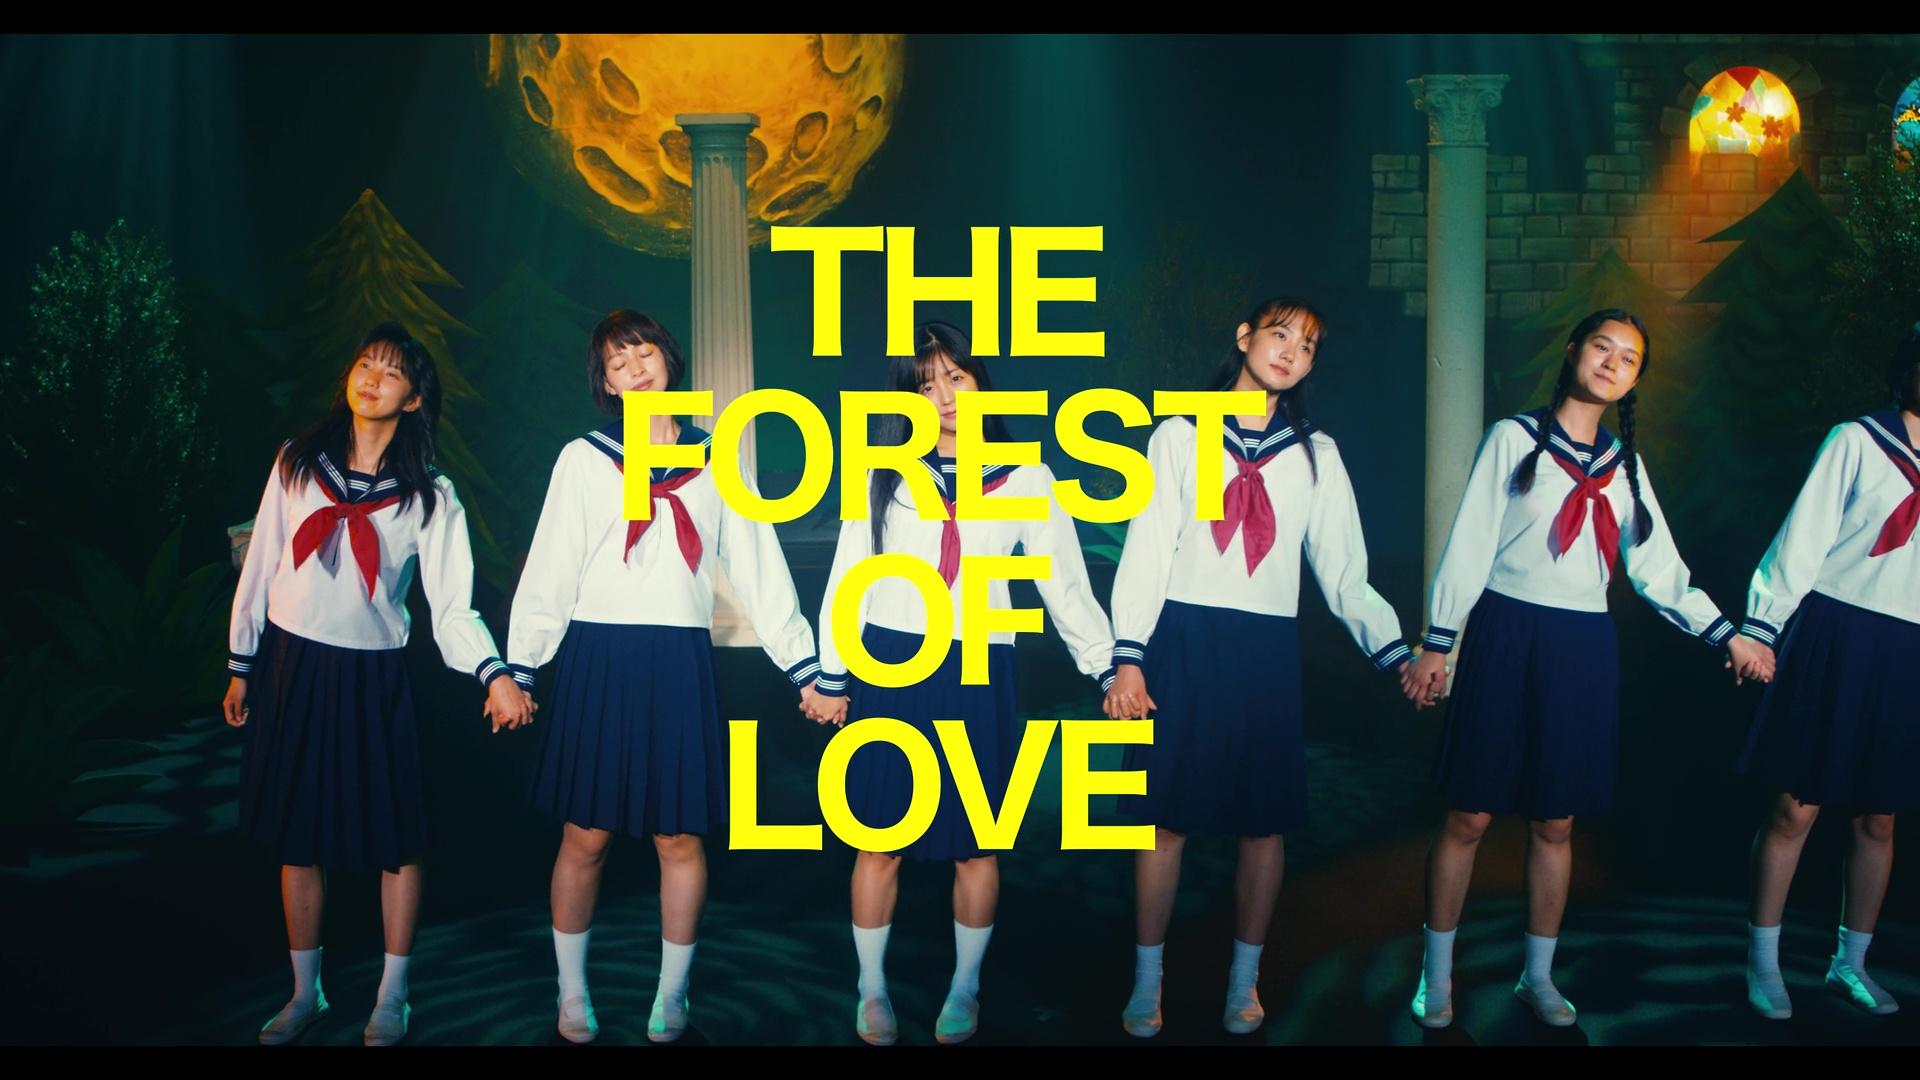 THE FOREST OF LOVE DEEP CUT (愛なき森で叫べ) de Sono Sion (2020)